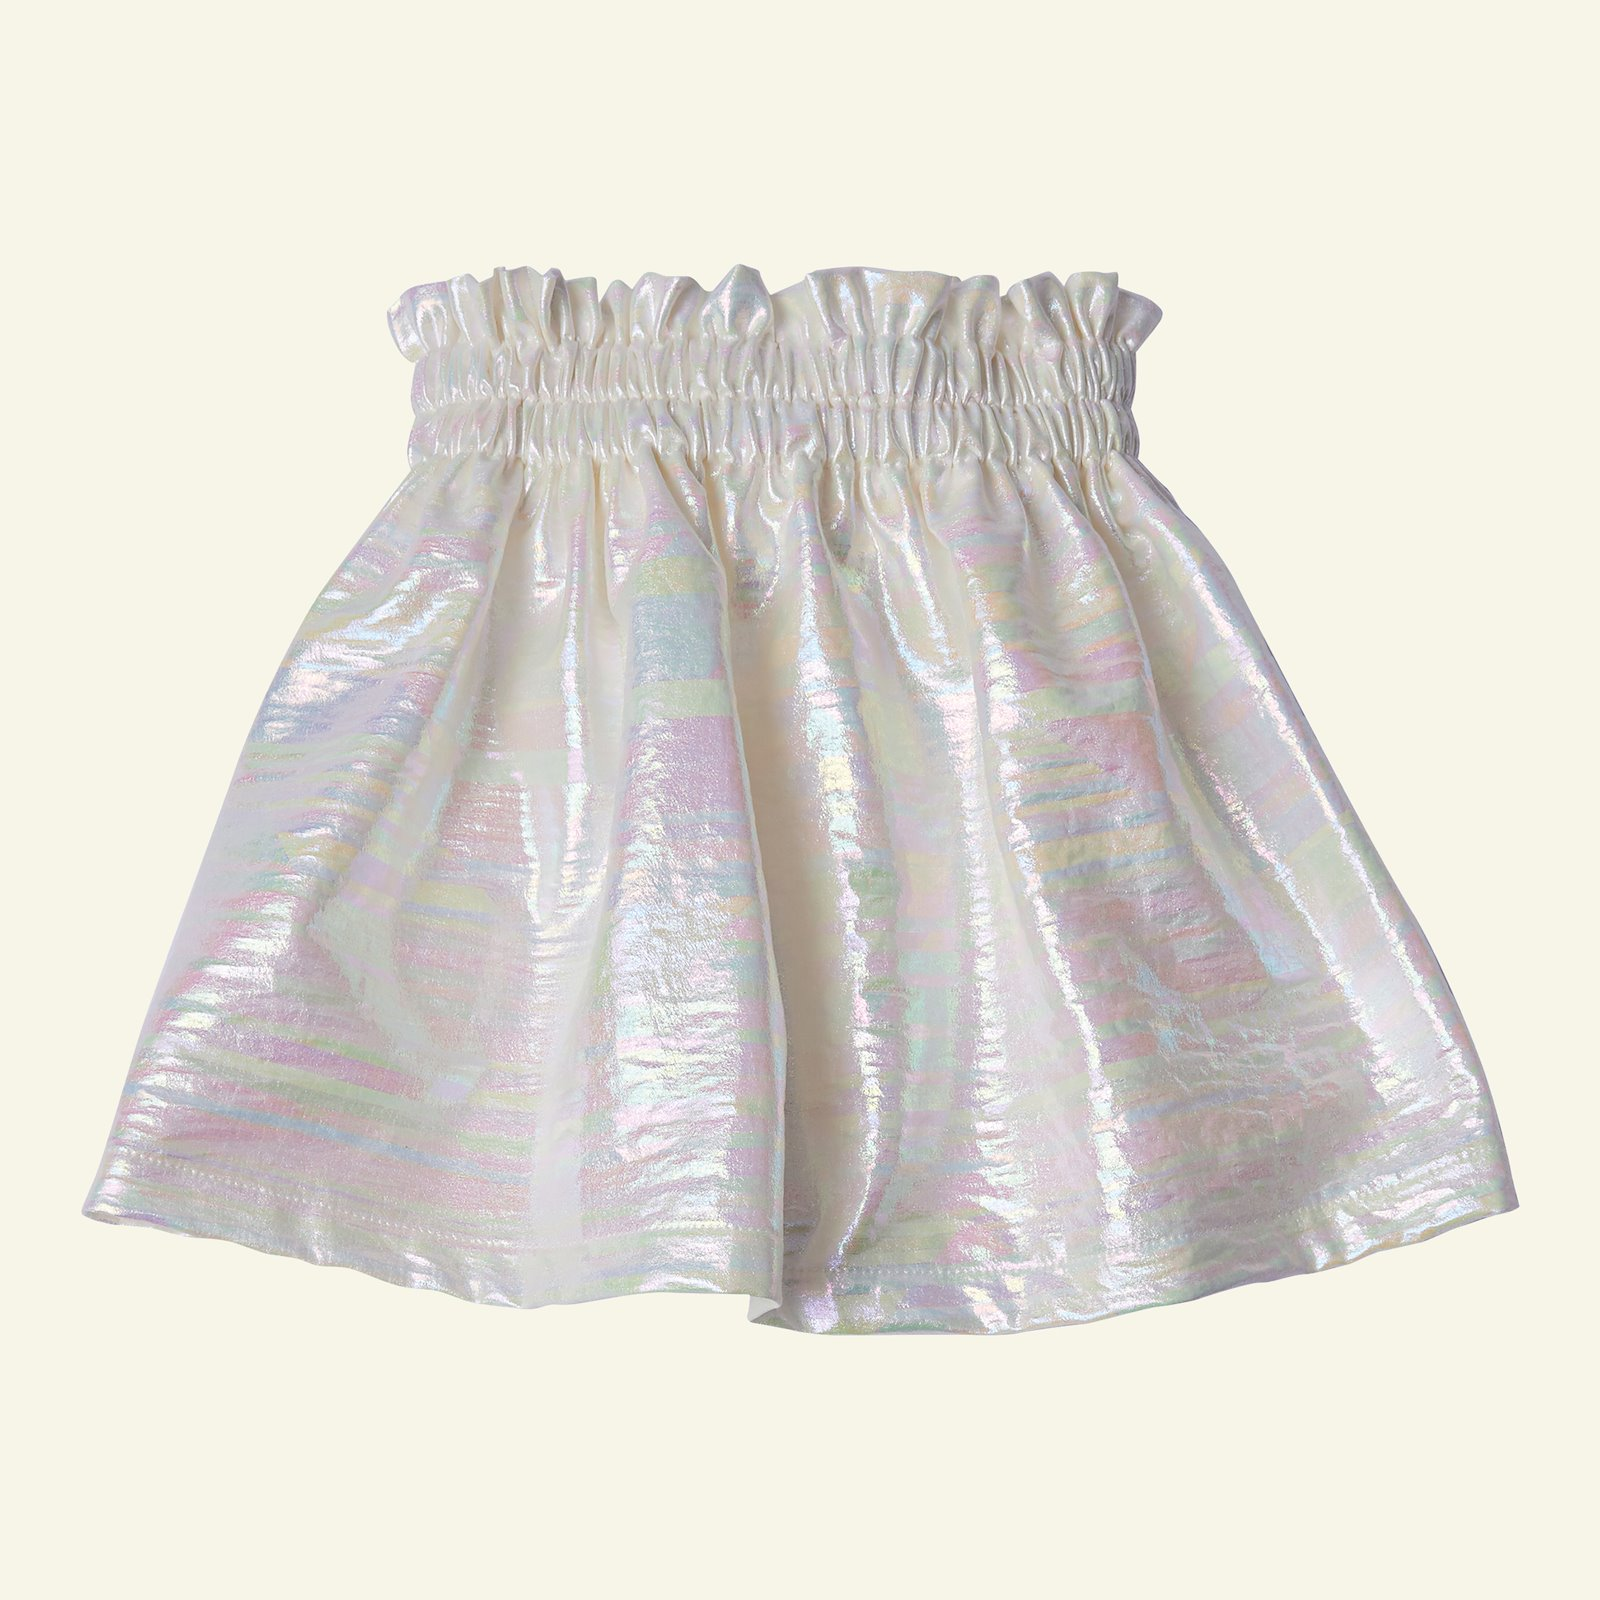 Wide skirt p61020_260687_sskit